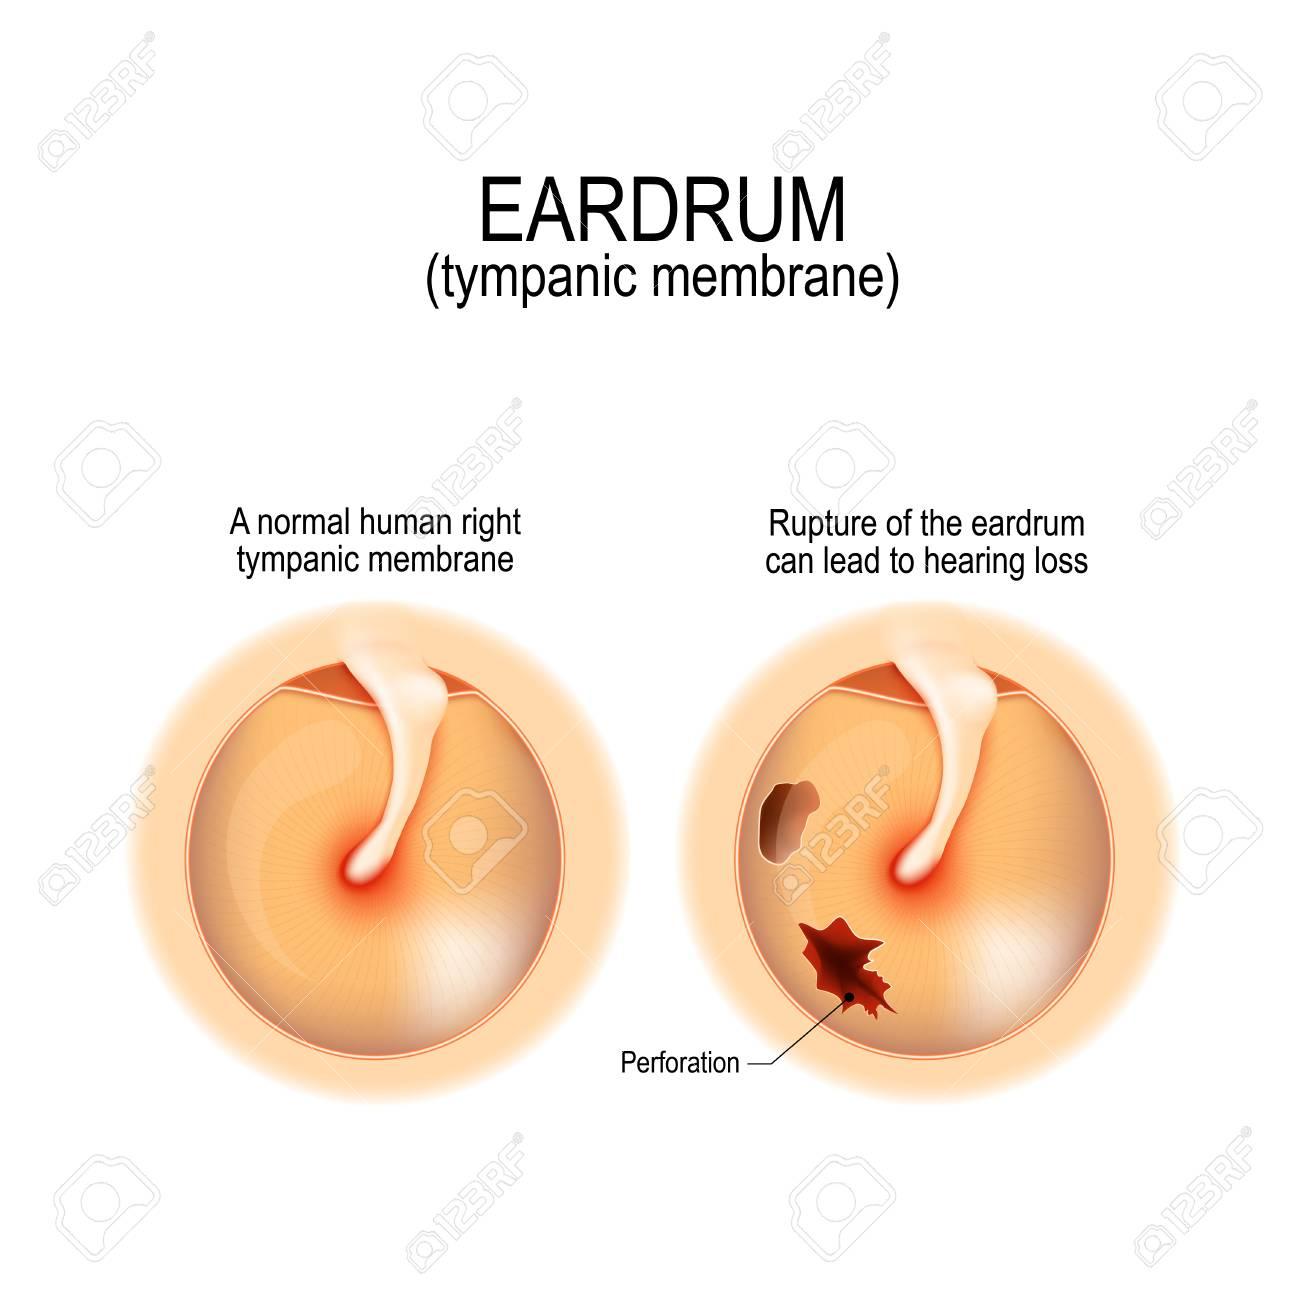 Ruptured Eardrum. Anatomy Of The Humans Eardrum. Healthy And ...